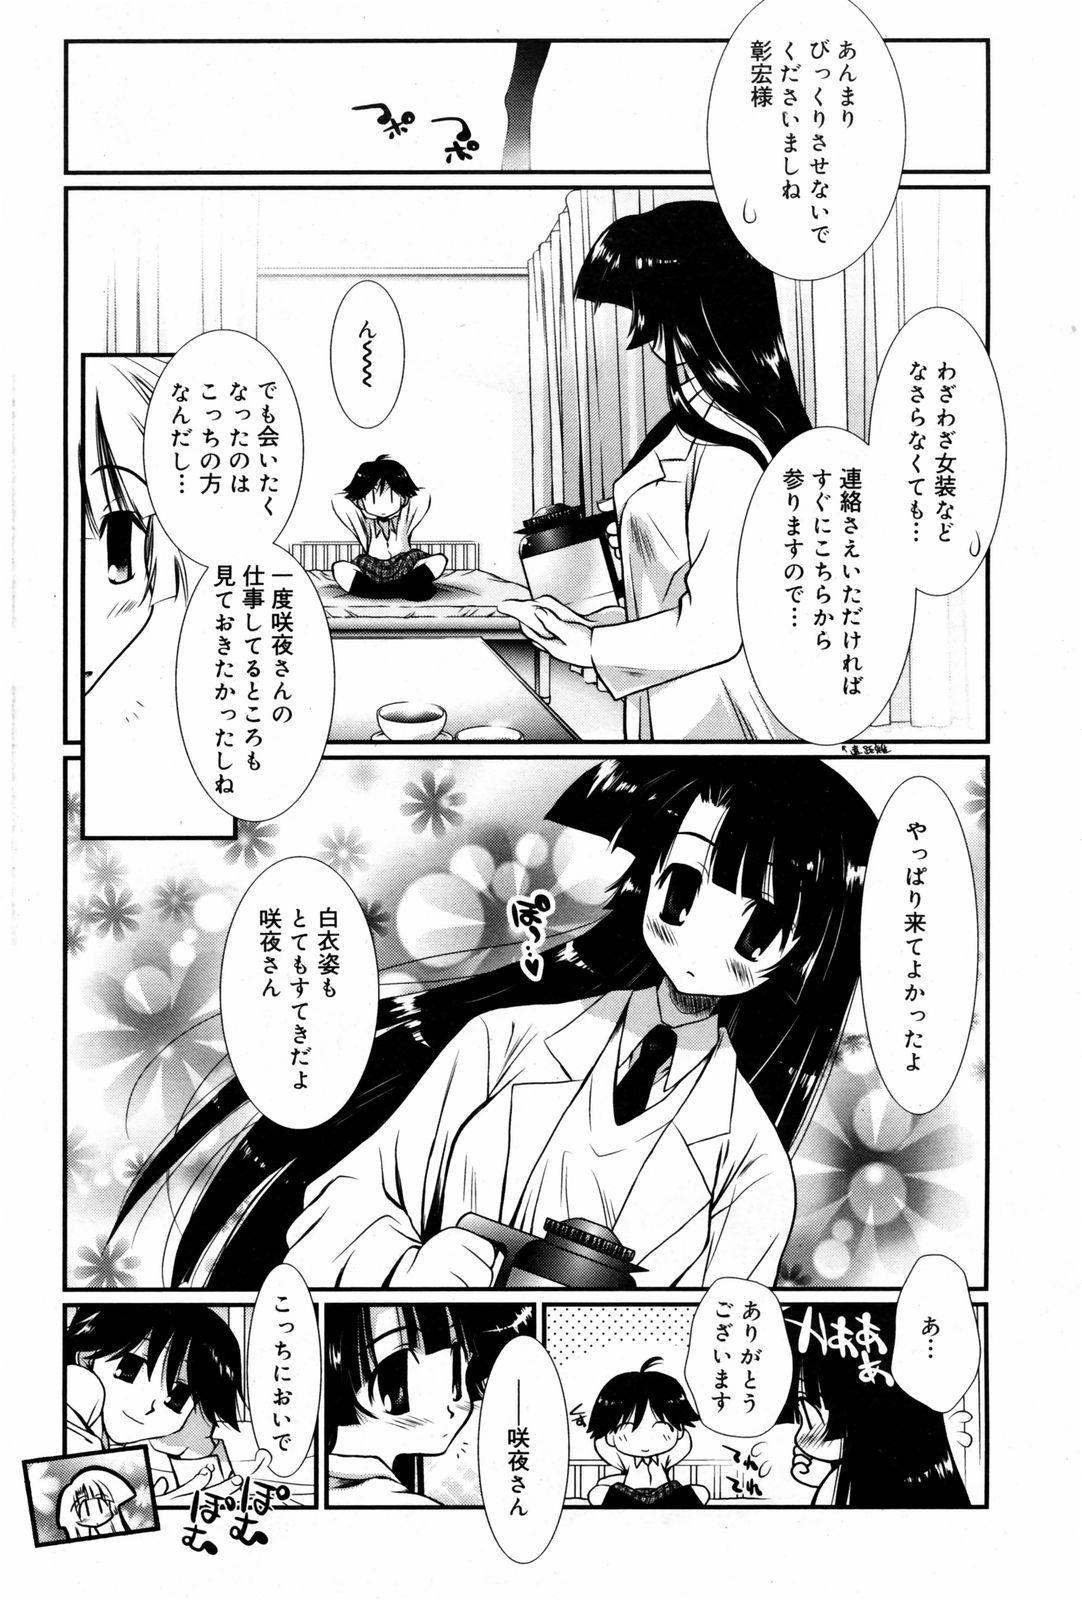 Manga Bangaichi 2008-03 59